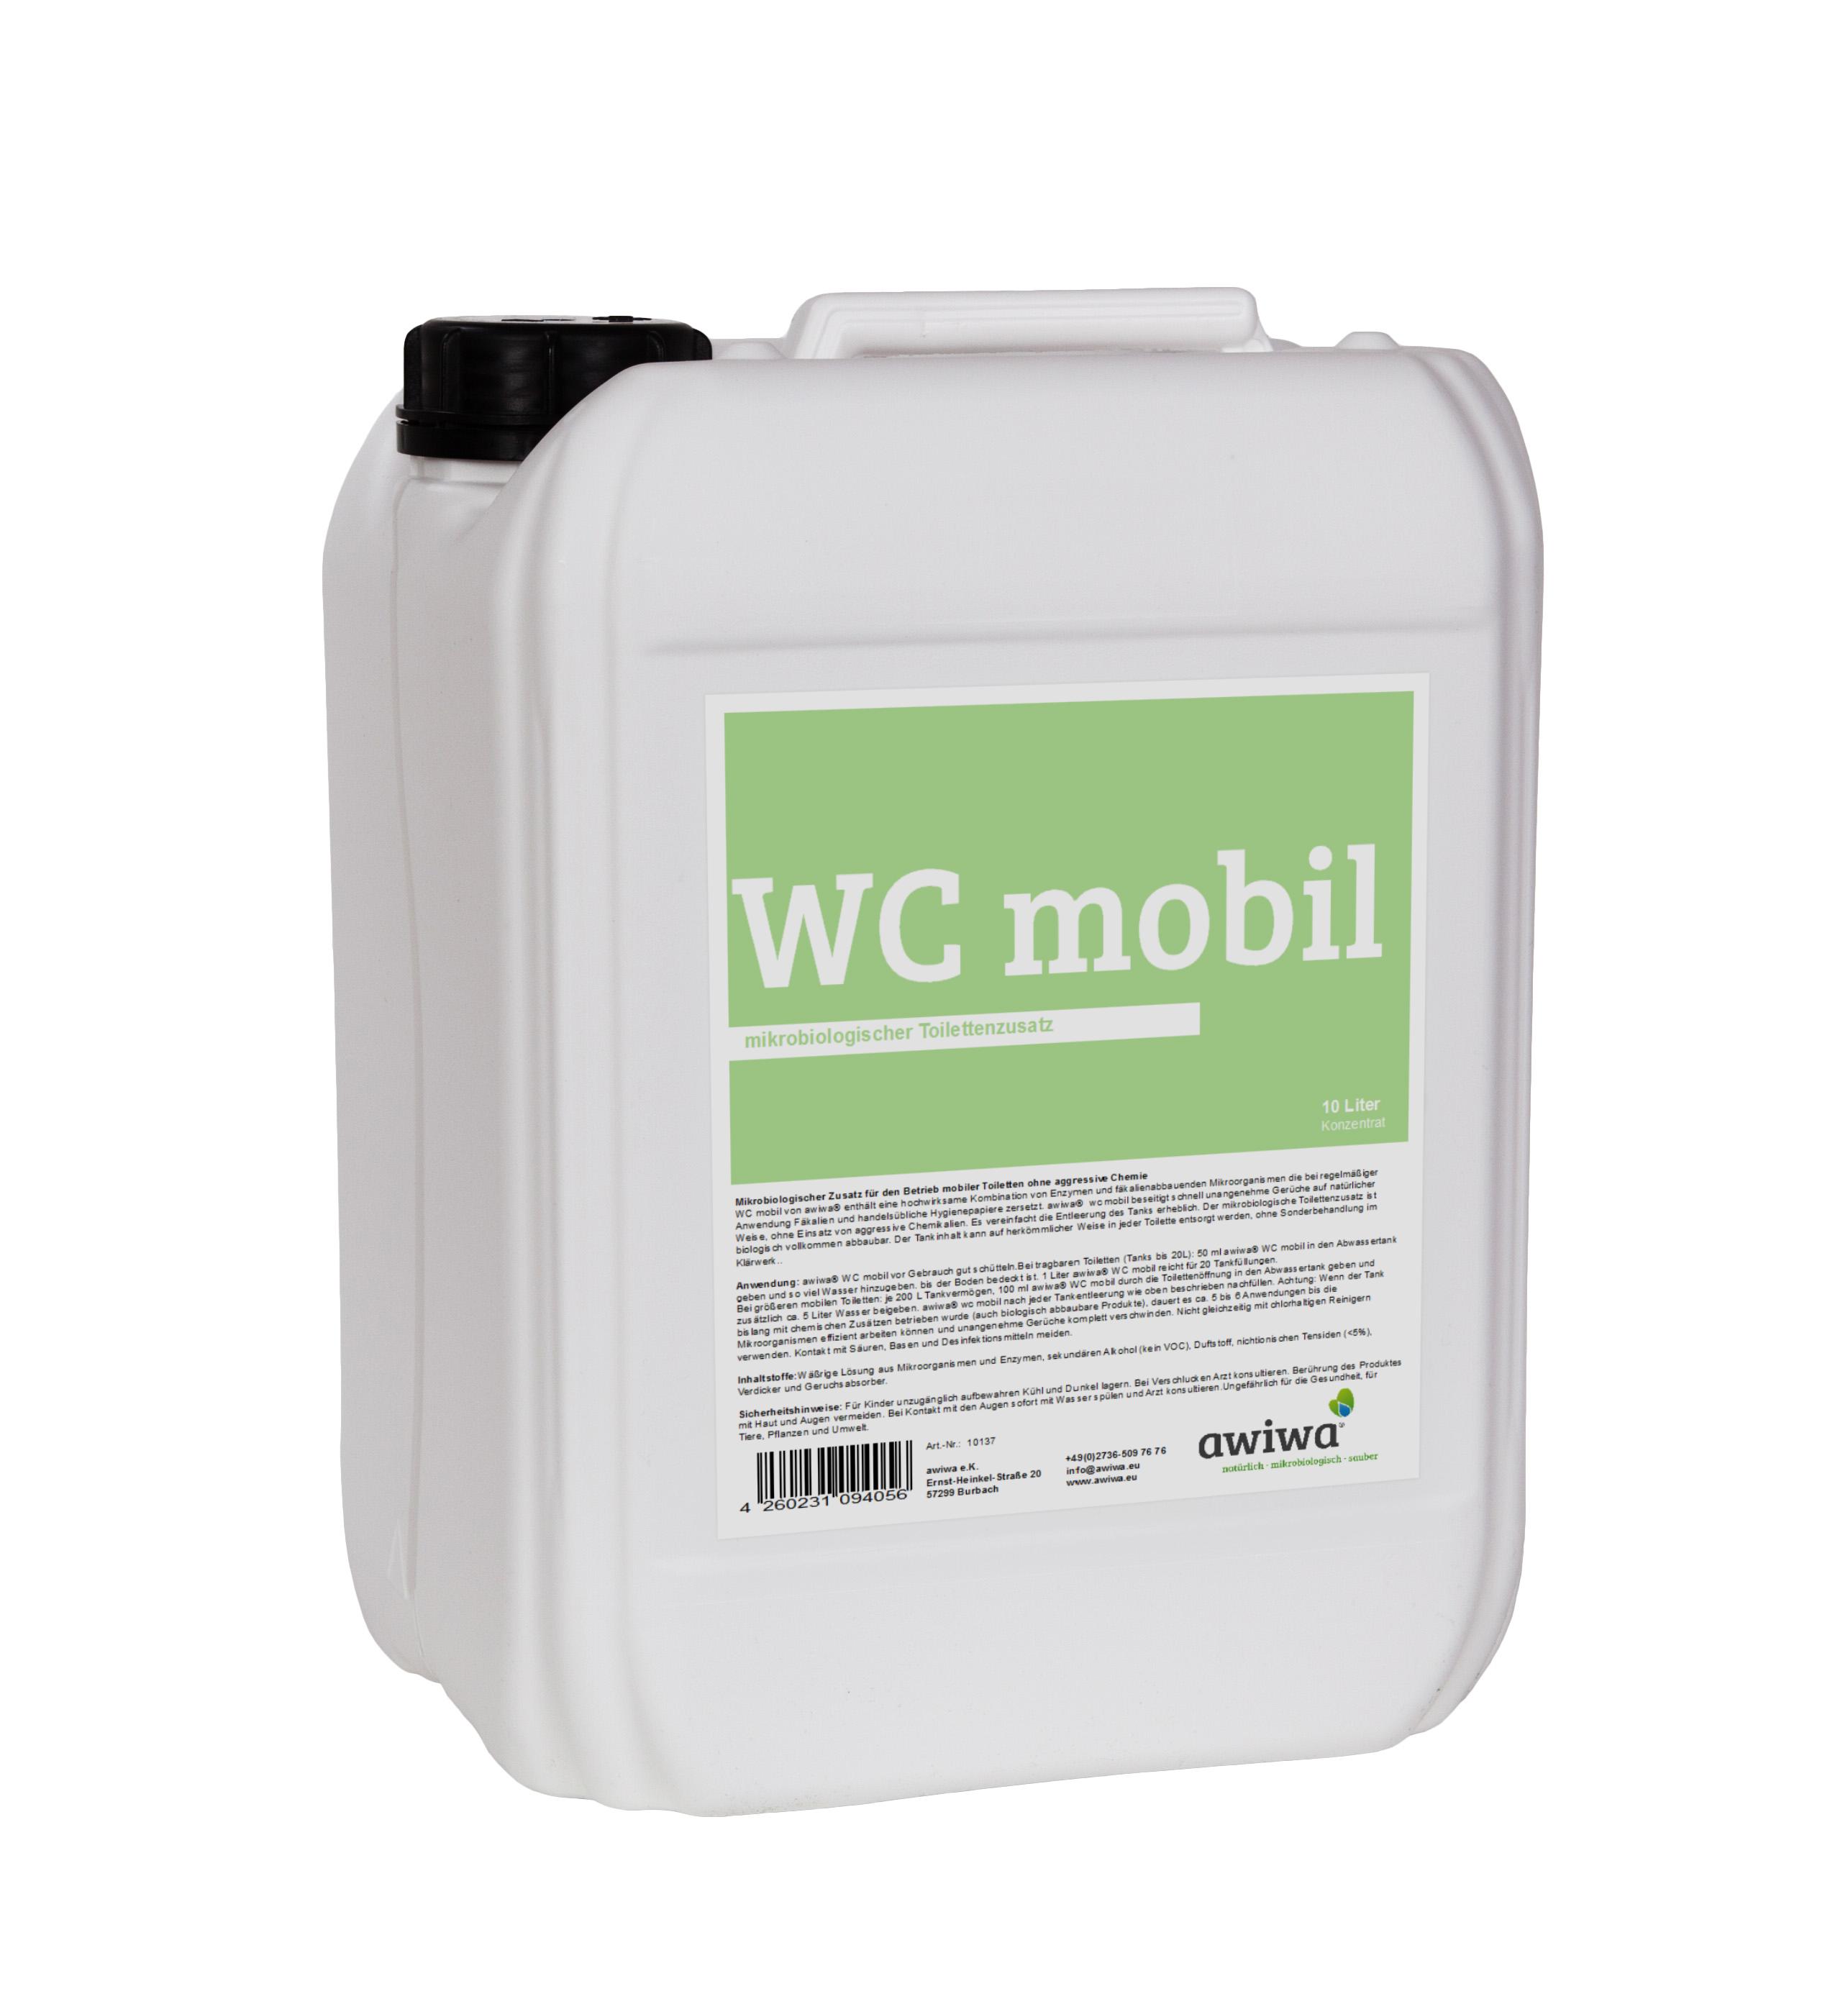 awiwa wc mobil mikrobiologischer camping toilettenzusatz. Black Bedroom Furniture Sets. Home Design Ideas